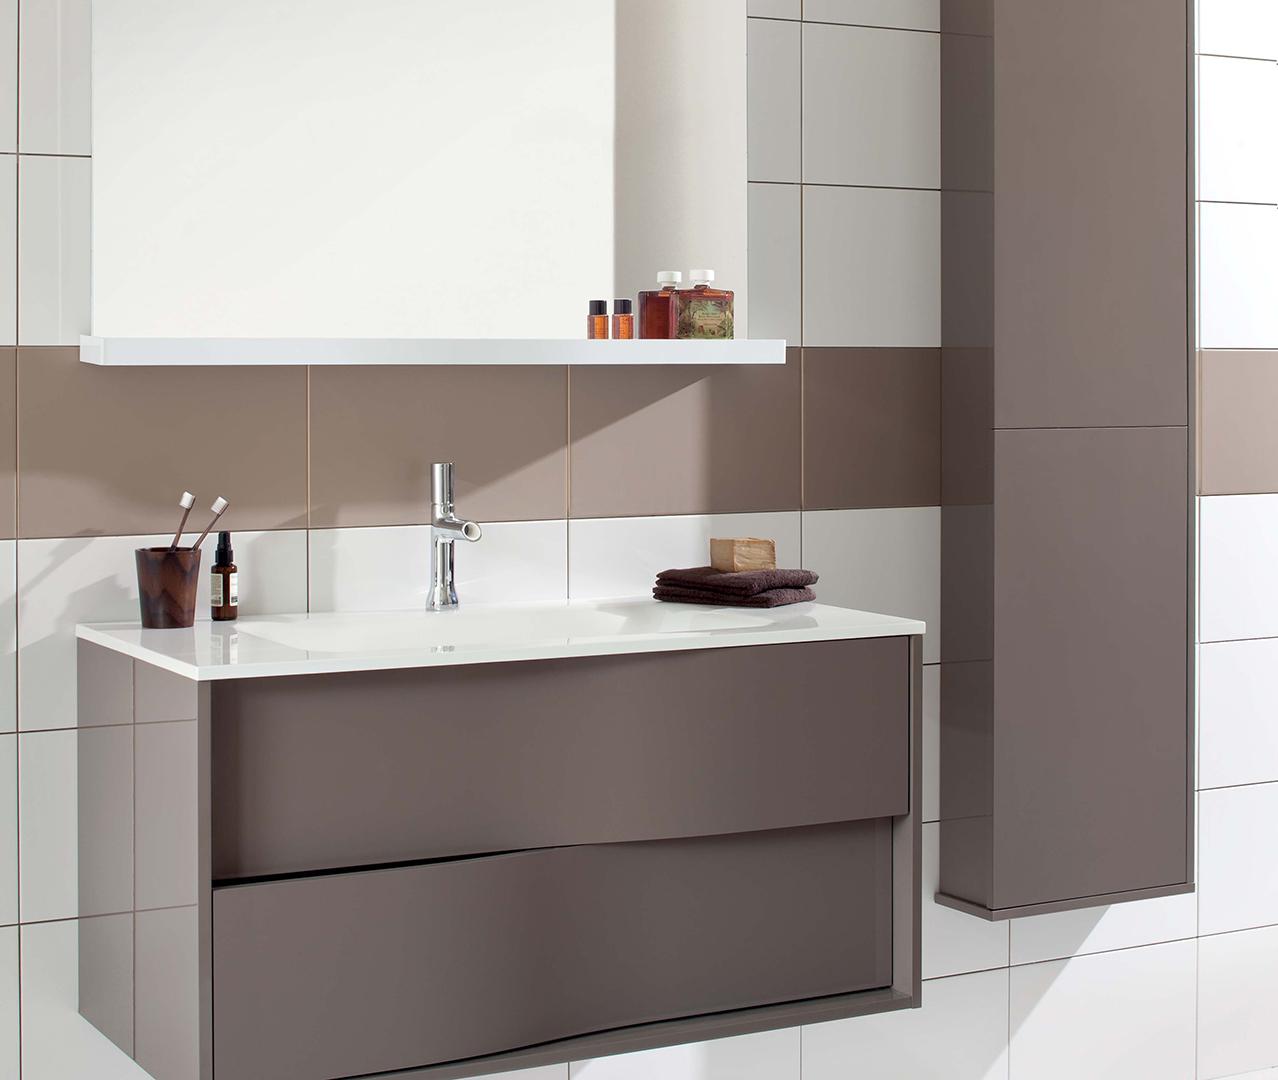 Gamme my lodge meuble salle de bain en bois sanijura for Configurer une salle de bain